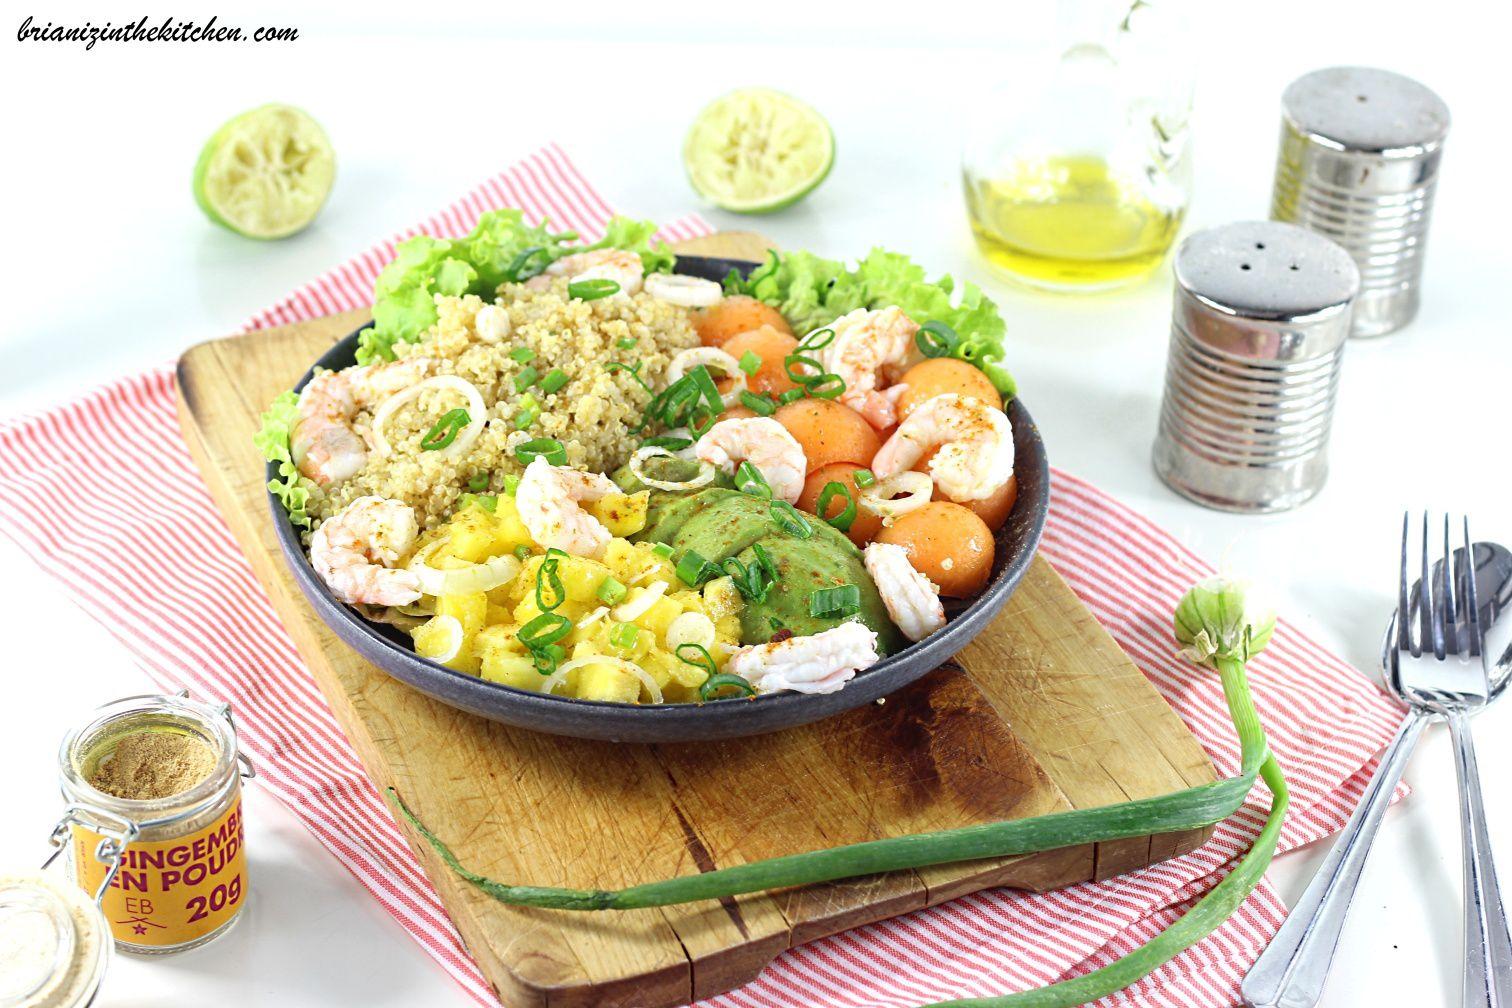 Buddha Bowl Summer {Quinoa, Avocat, Melon, Mangue et Crevettes}